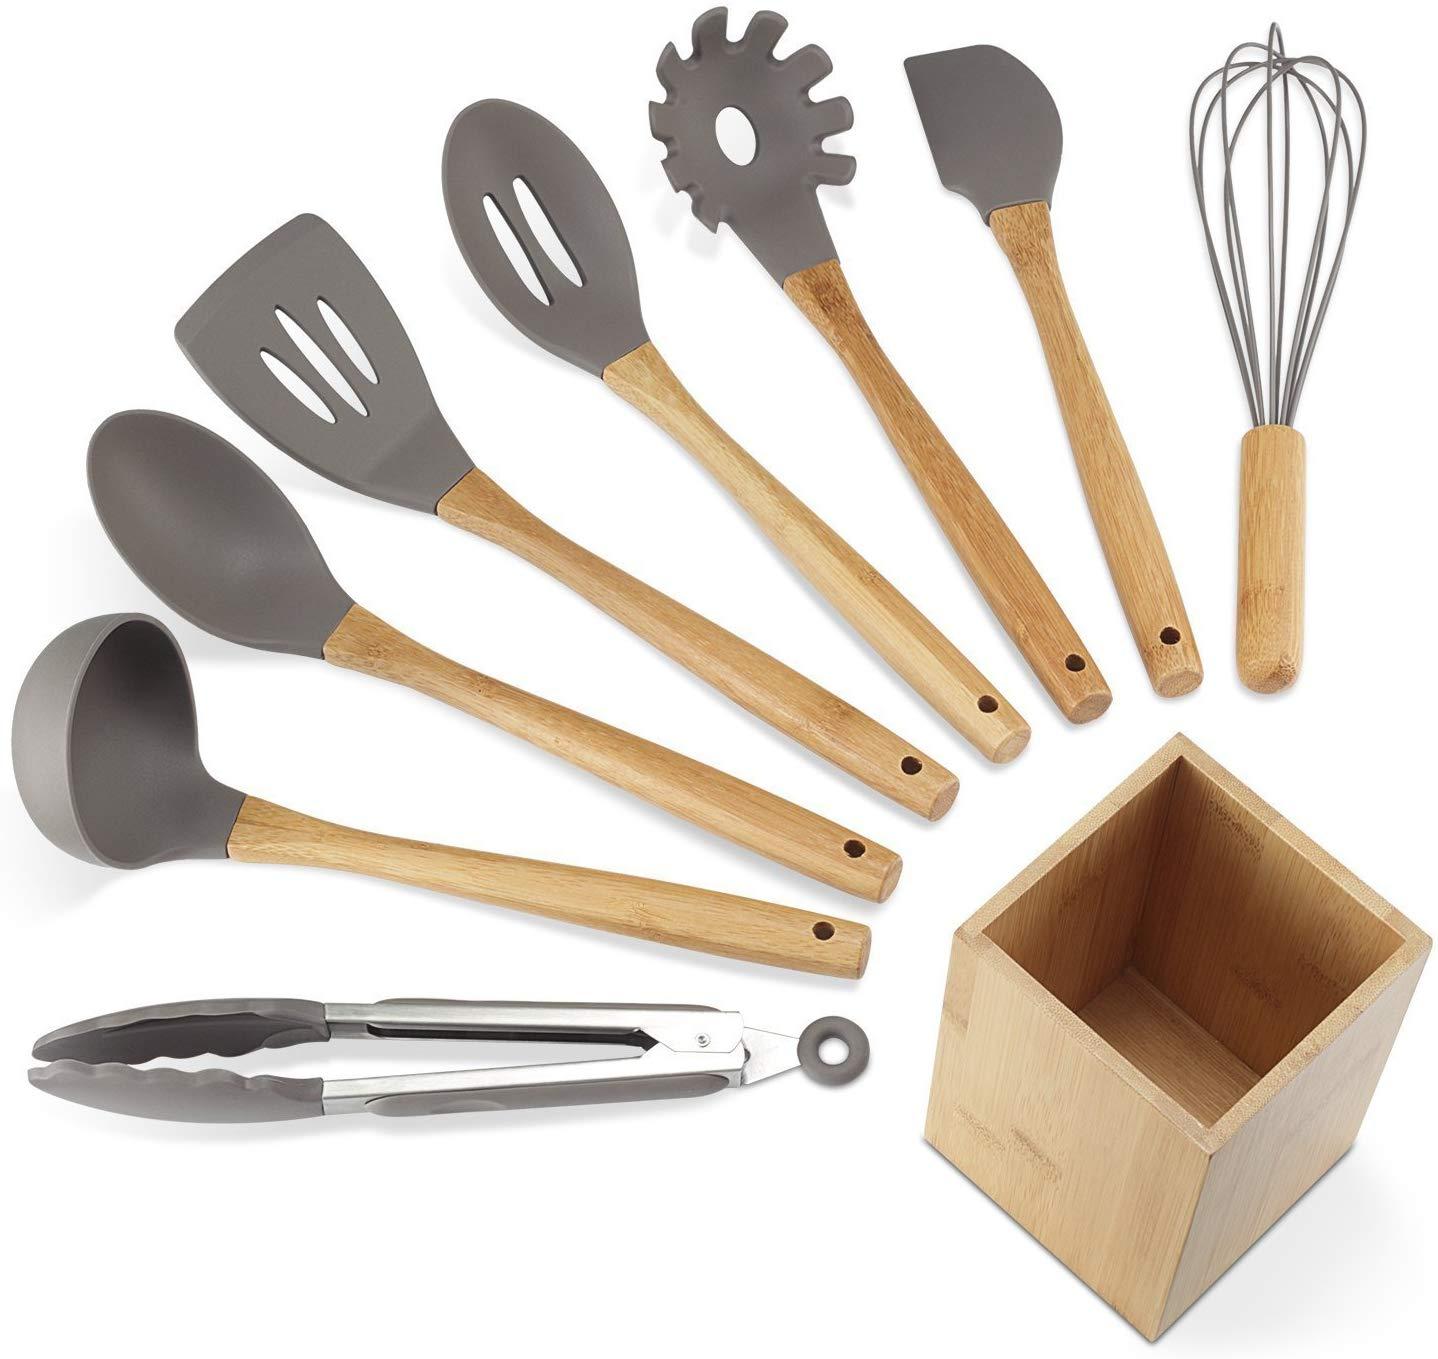 NEXGADGET, Premium Silicone Kitchen Utensils (9 Pieces)